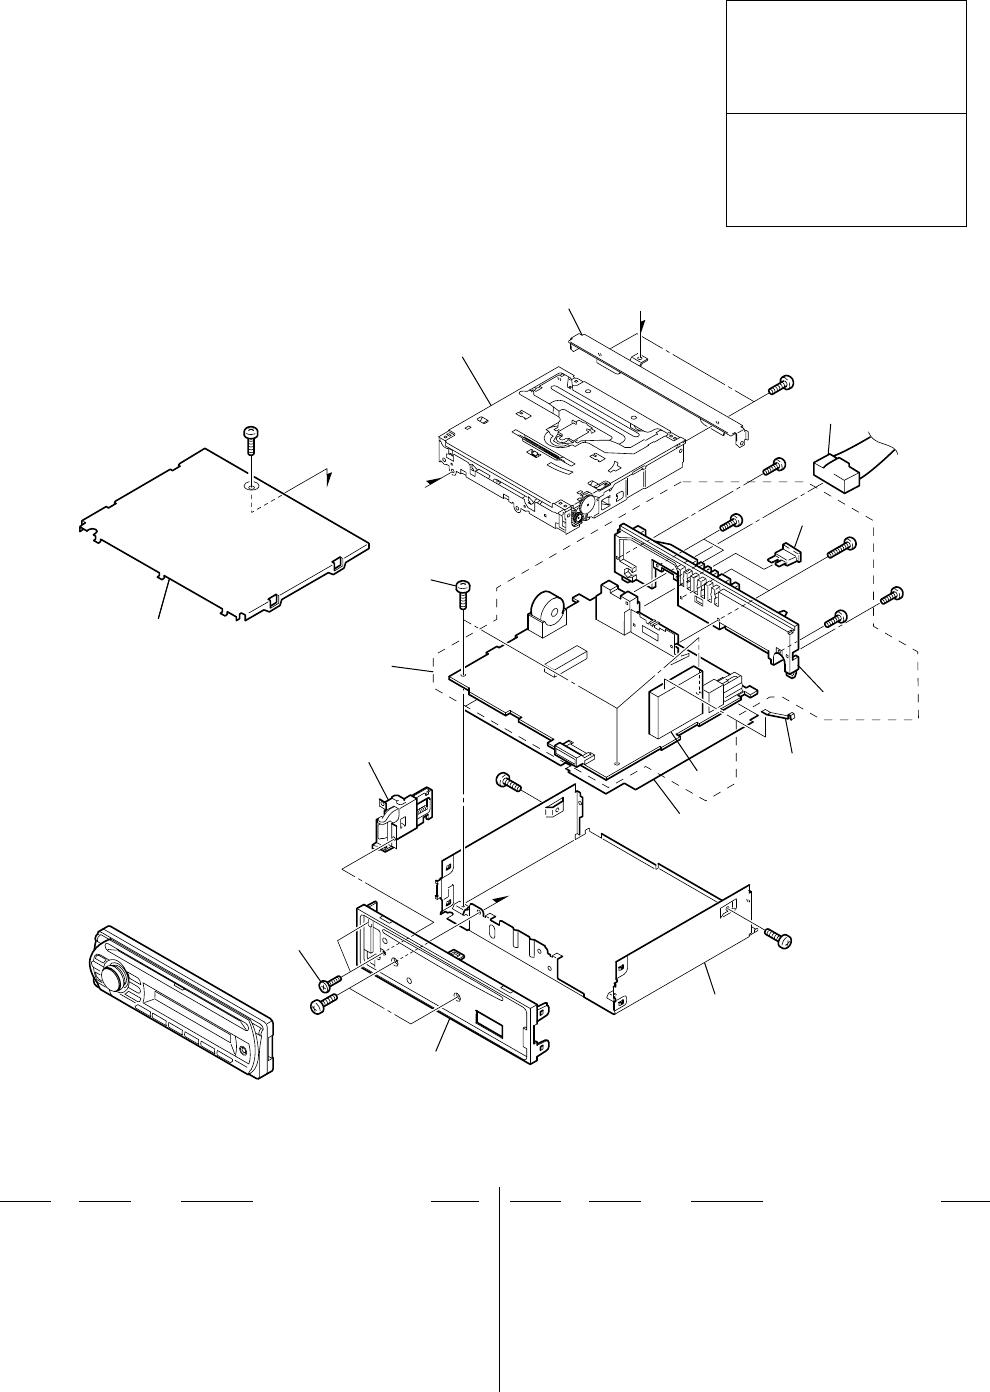 Sony Xplod Cdx Gt210 Wiring Diagram On Sony Cdx Gt210 Wiring Diagram